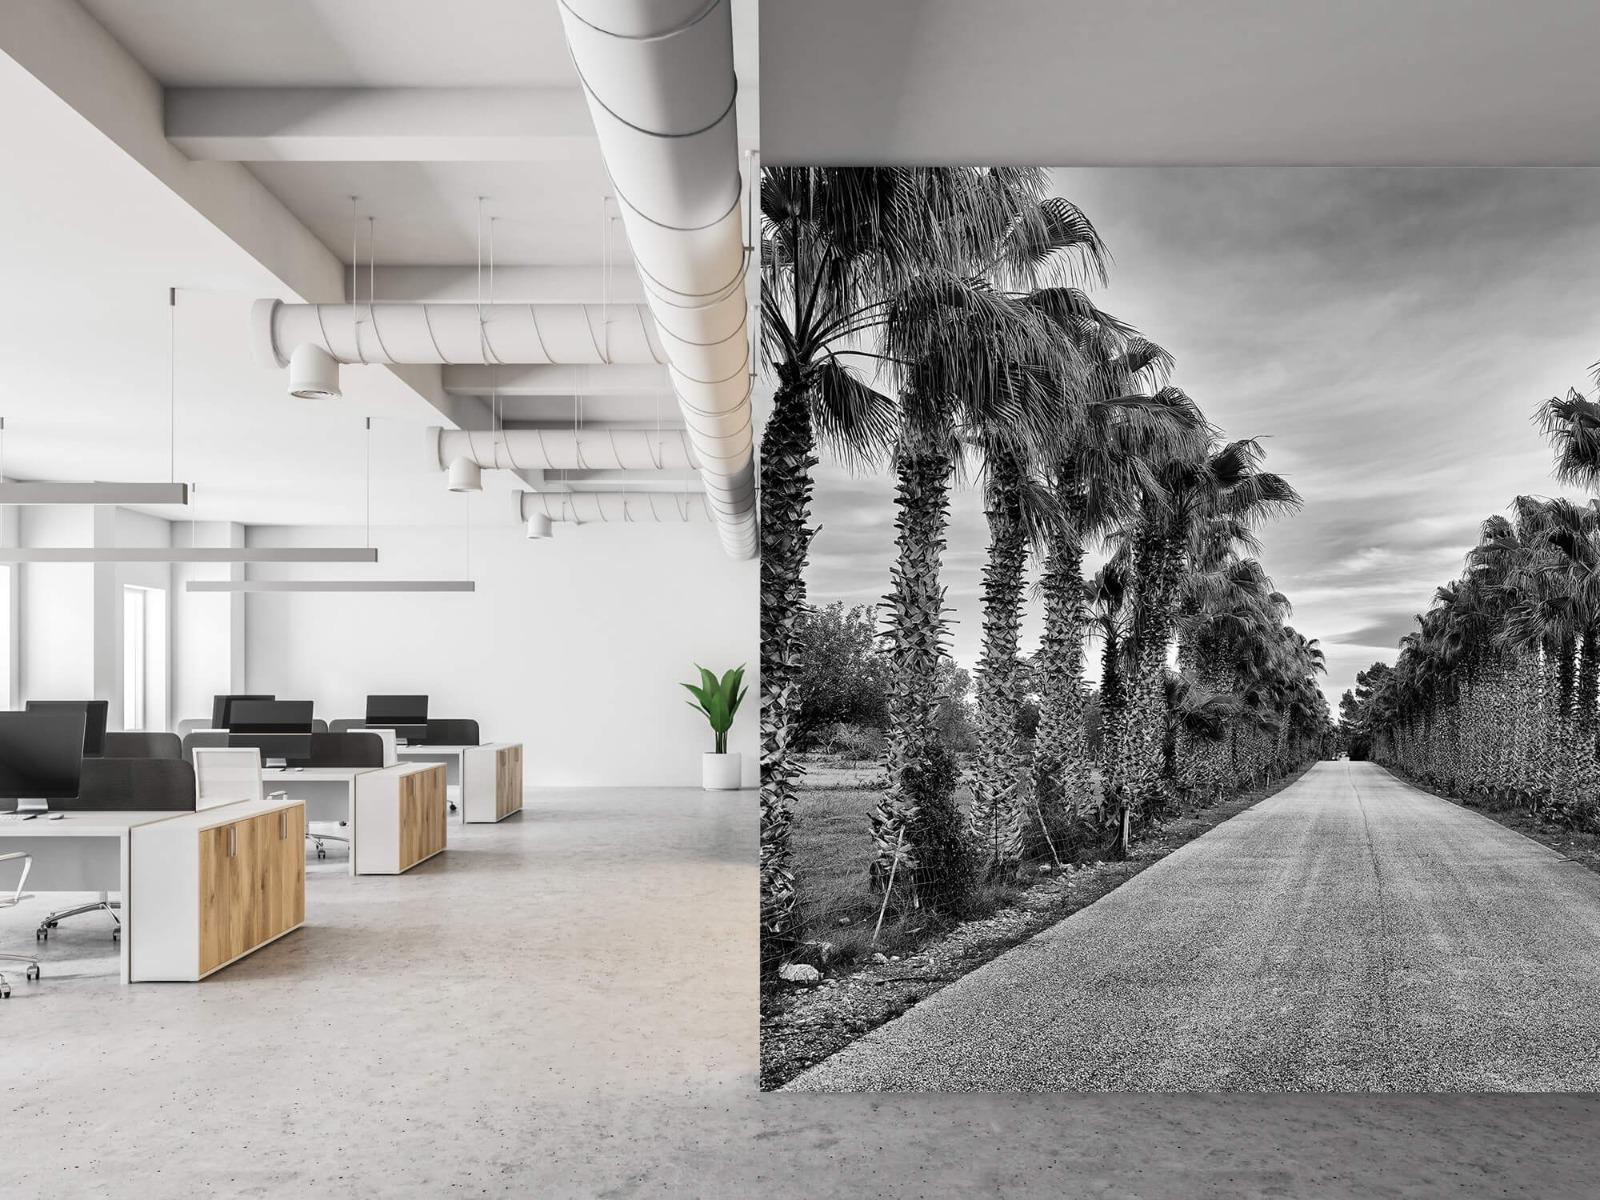 Palmbomen - Straat met palmbomen - Woonkamer 21